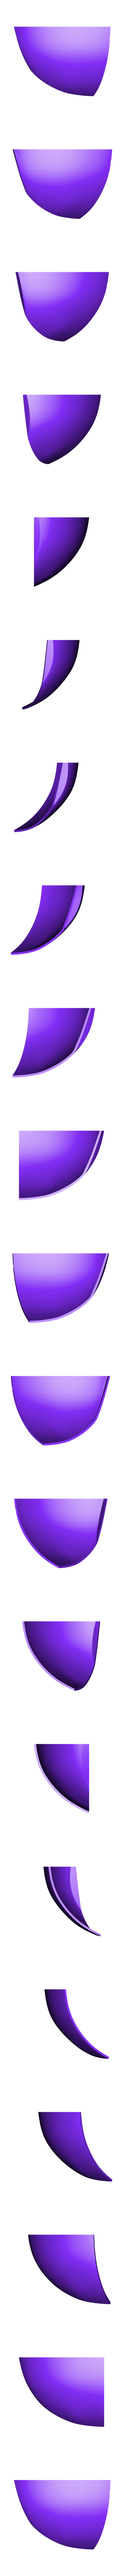 Part_3_v2.stl Download free STL file Battlestar Galactica Colonial Viper Pilot Helmet • 3D printing object, VillainousPropShop